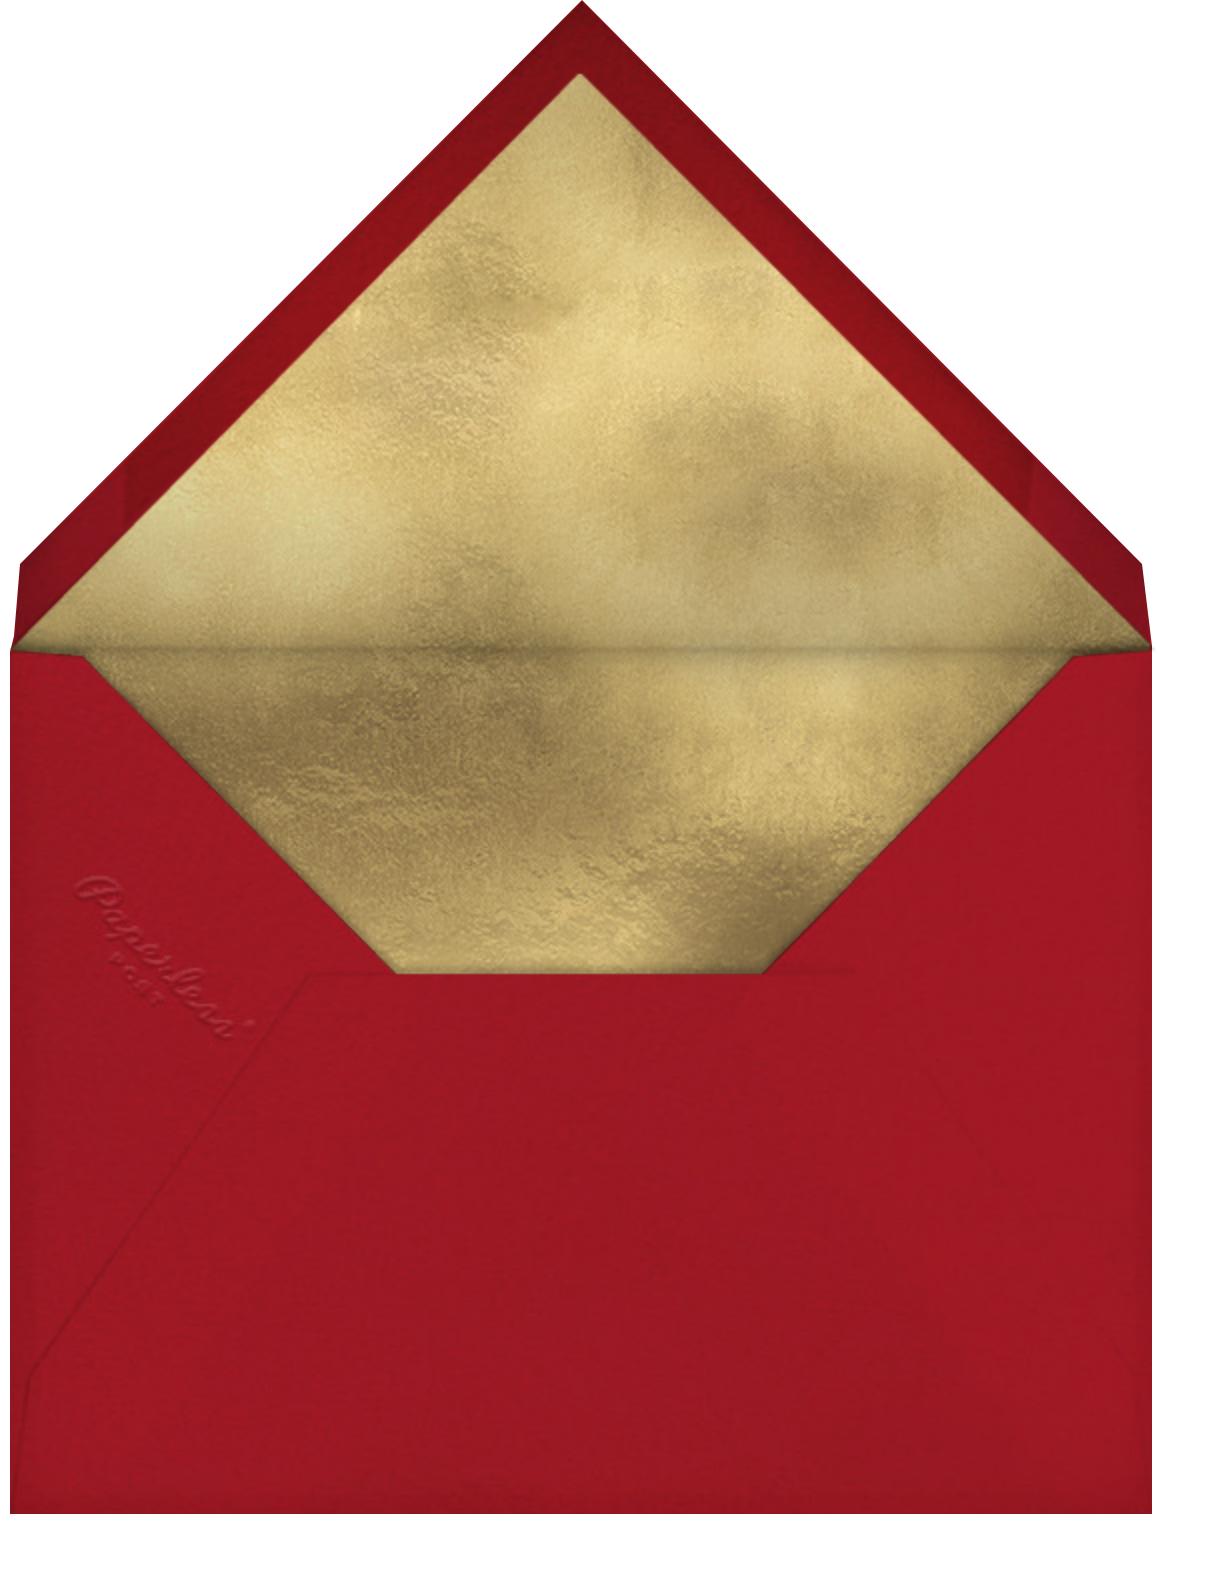 Mitzvah Marquee - B'not - Paperless Post - Envelope